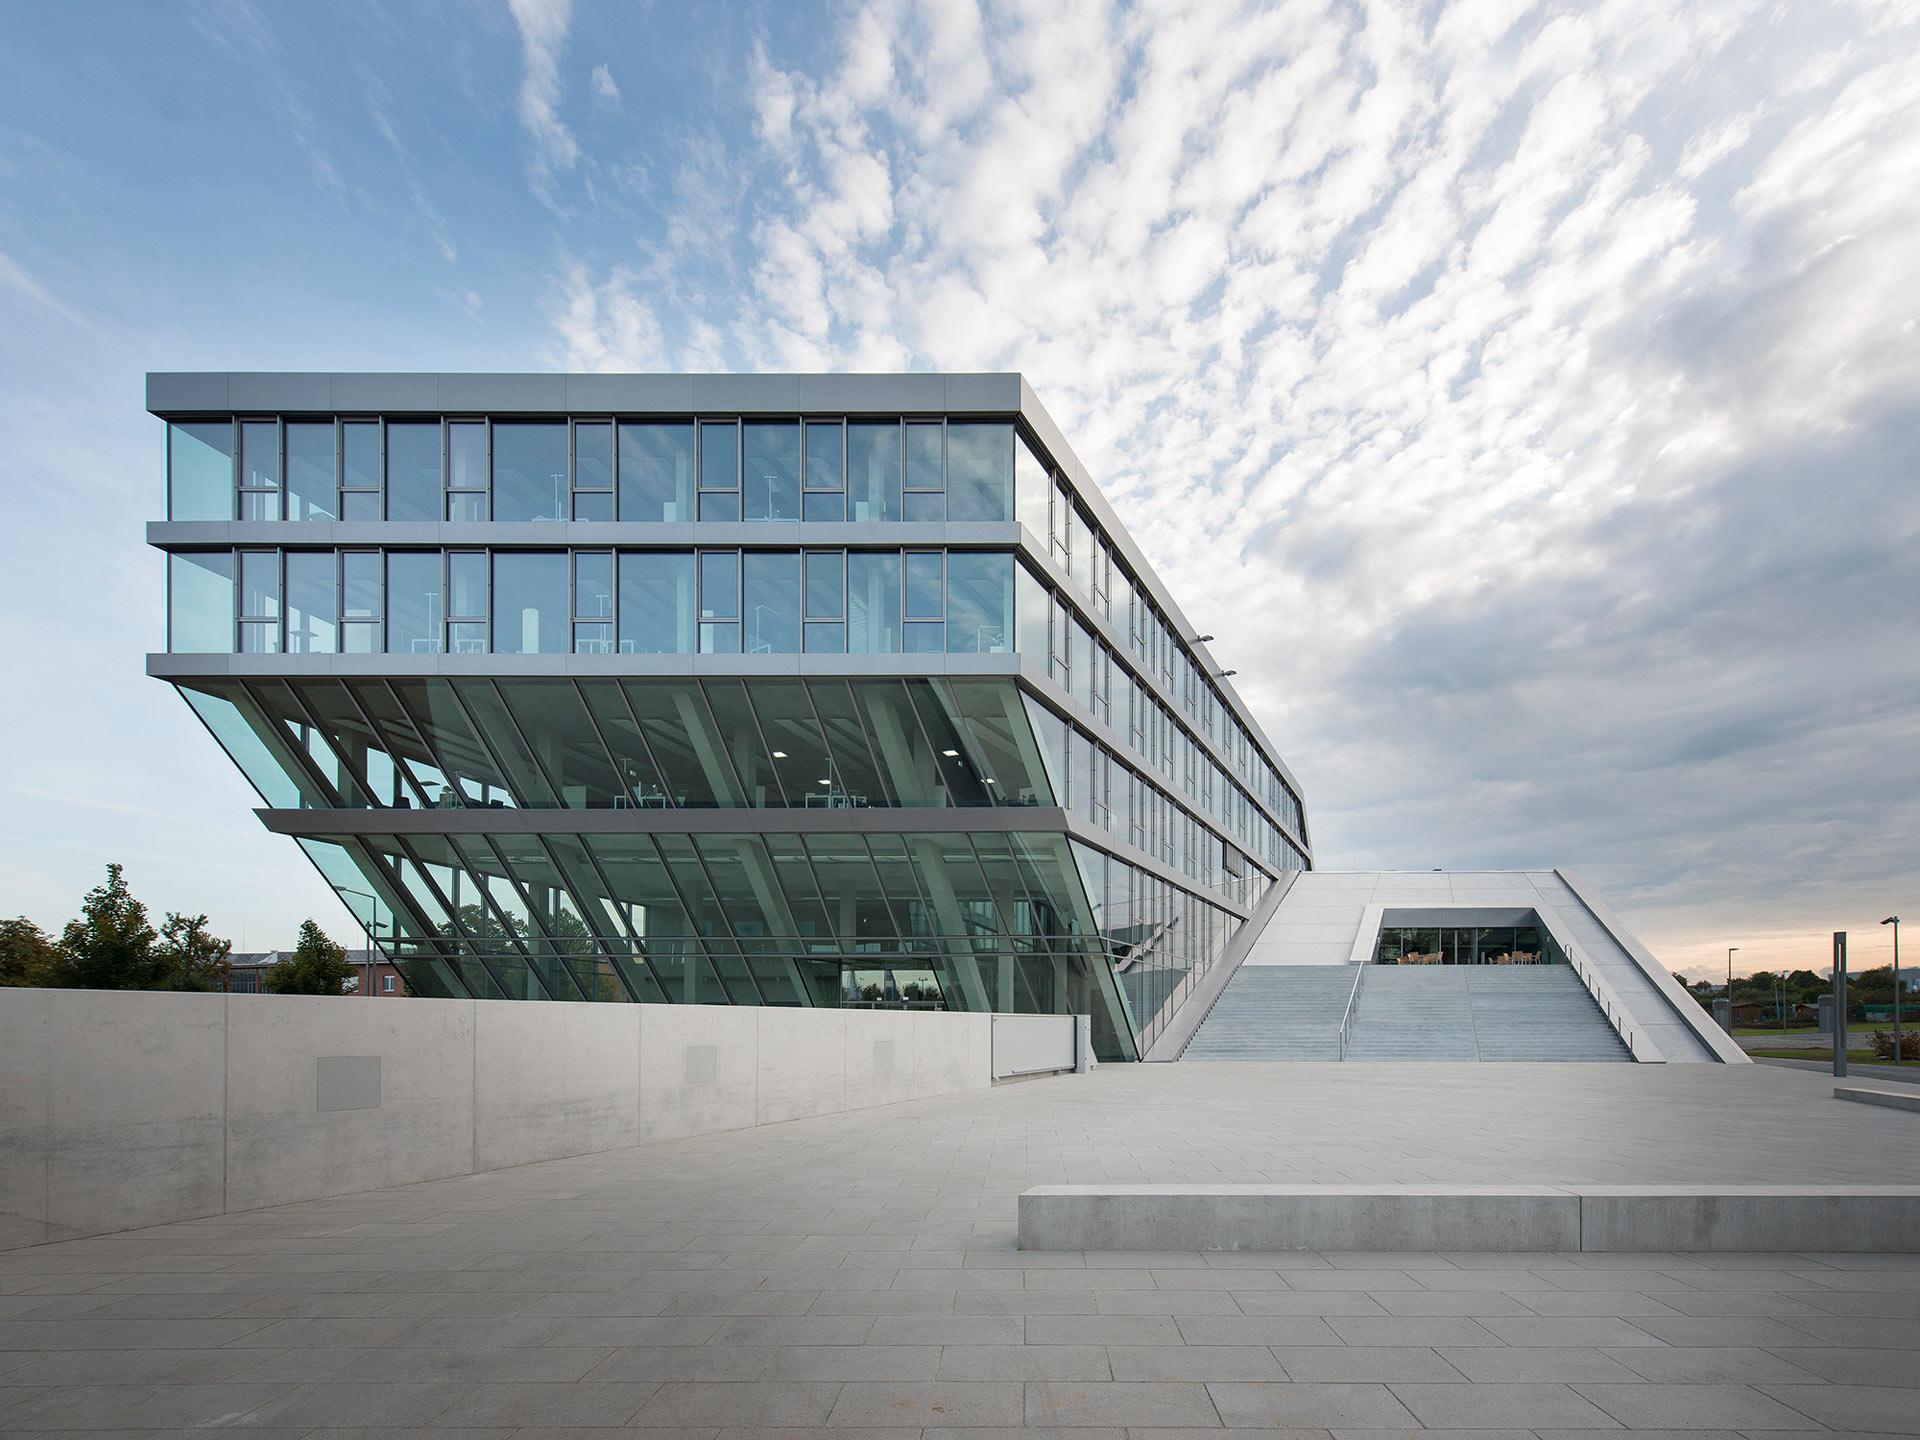 Hahn & Kolb Logistic Center